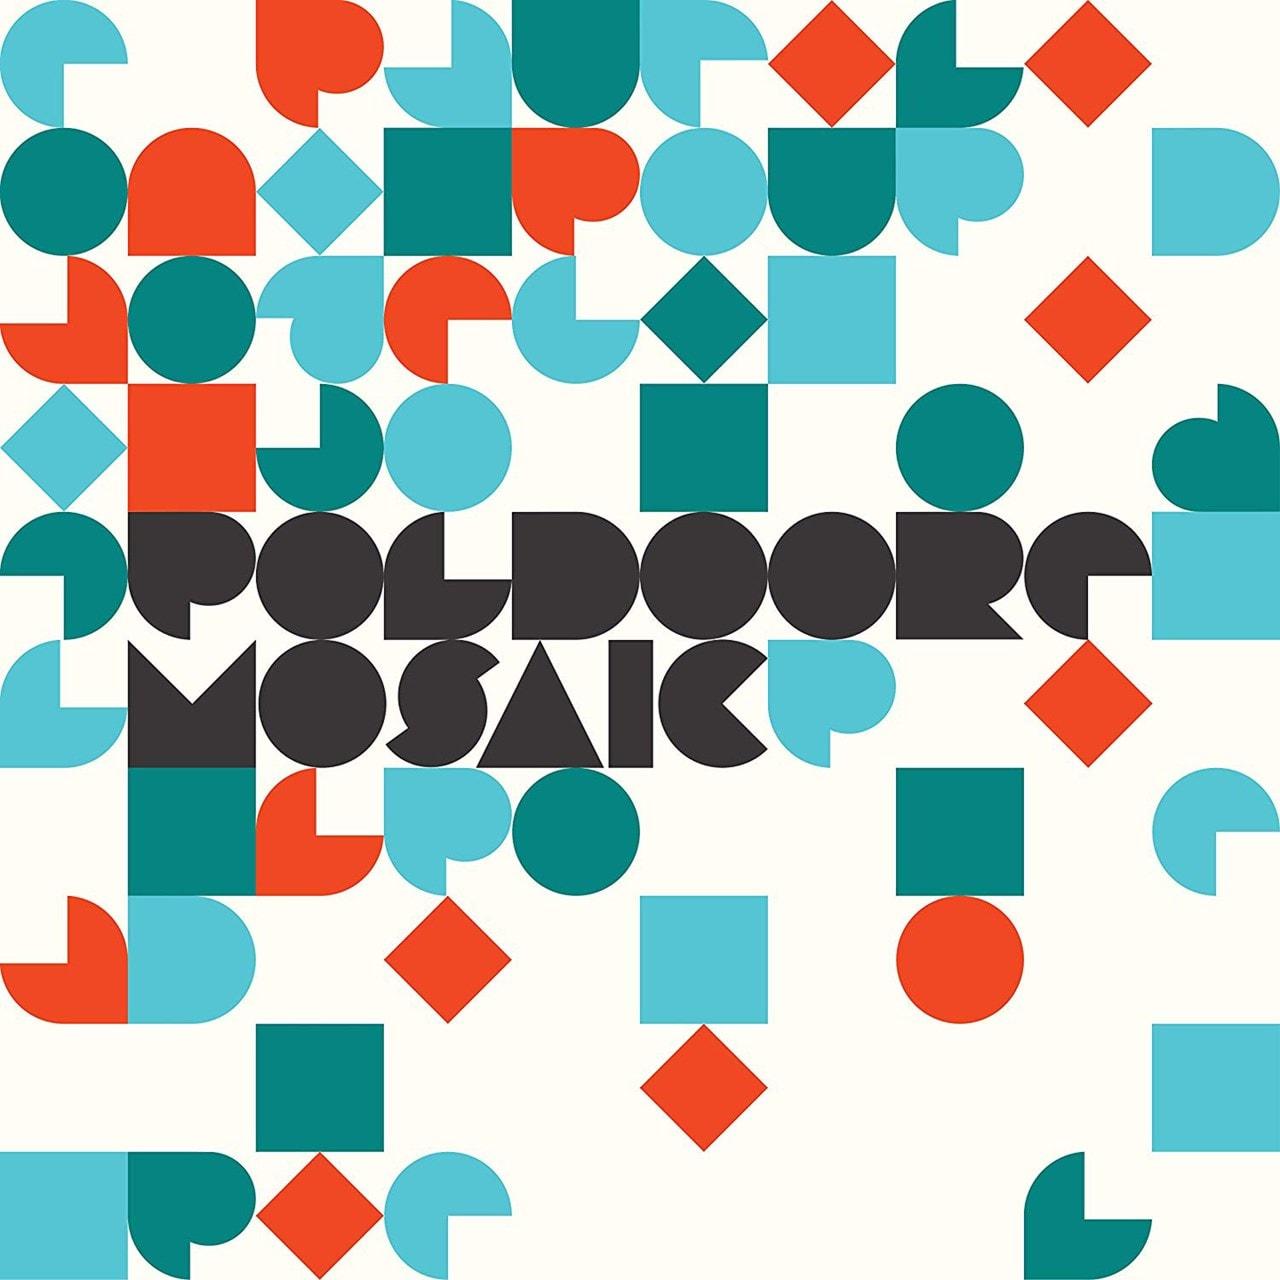 Mosaic - 1